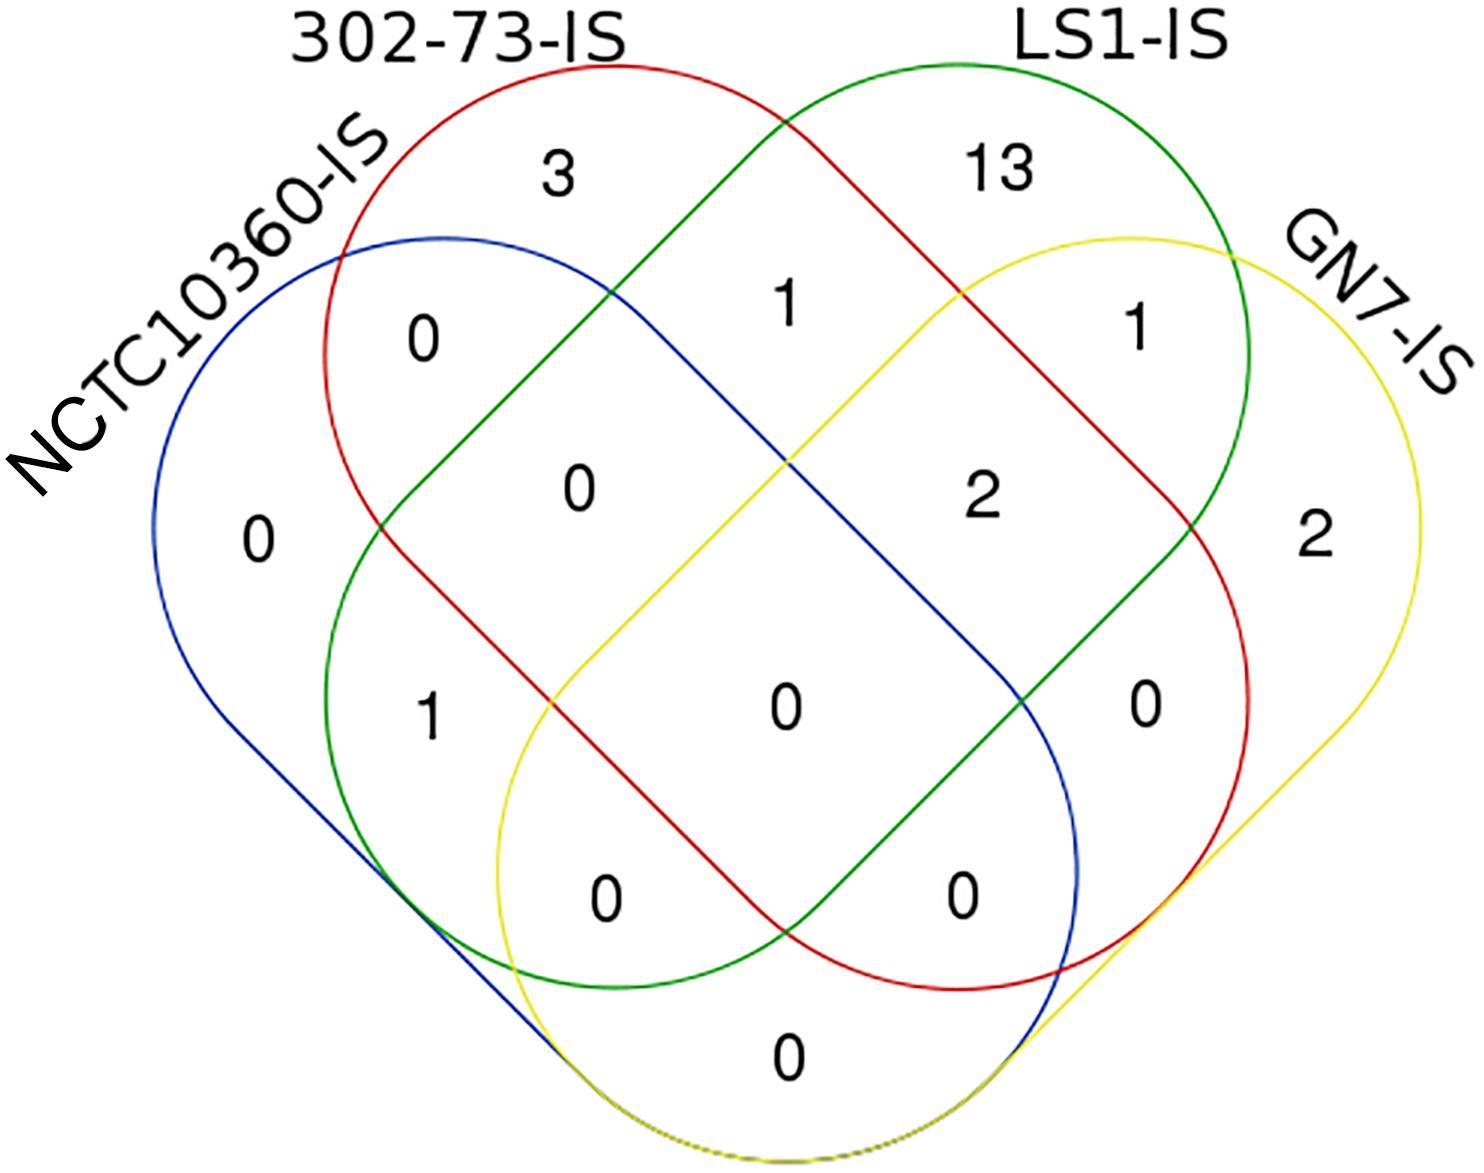 Frontiers | Pathogenomics of Virulence Traits of Plesiomonas